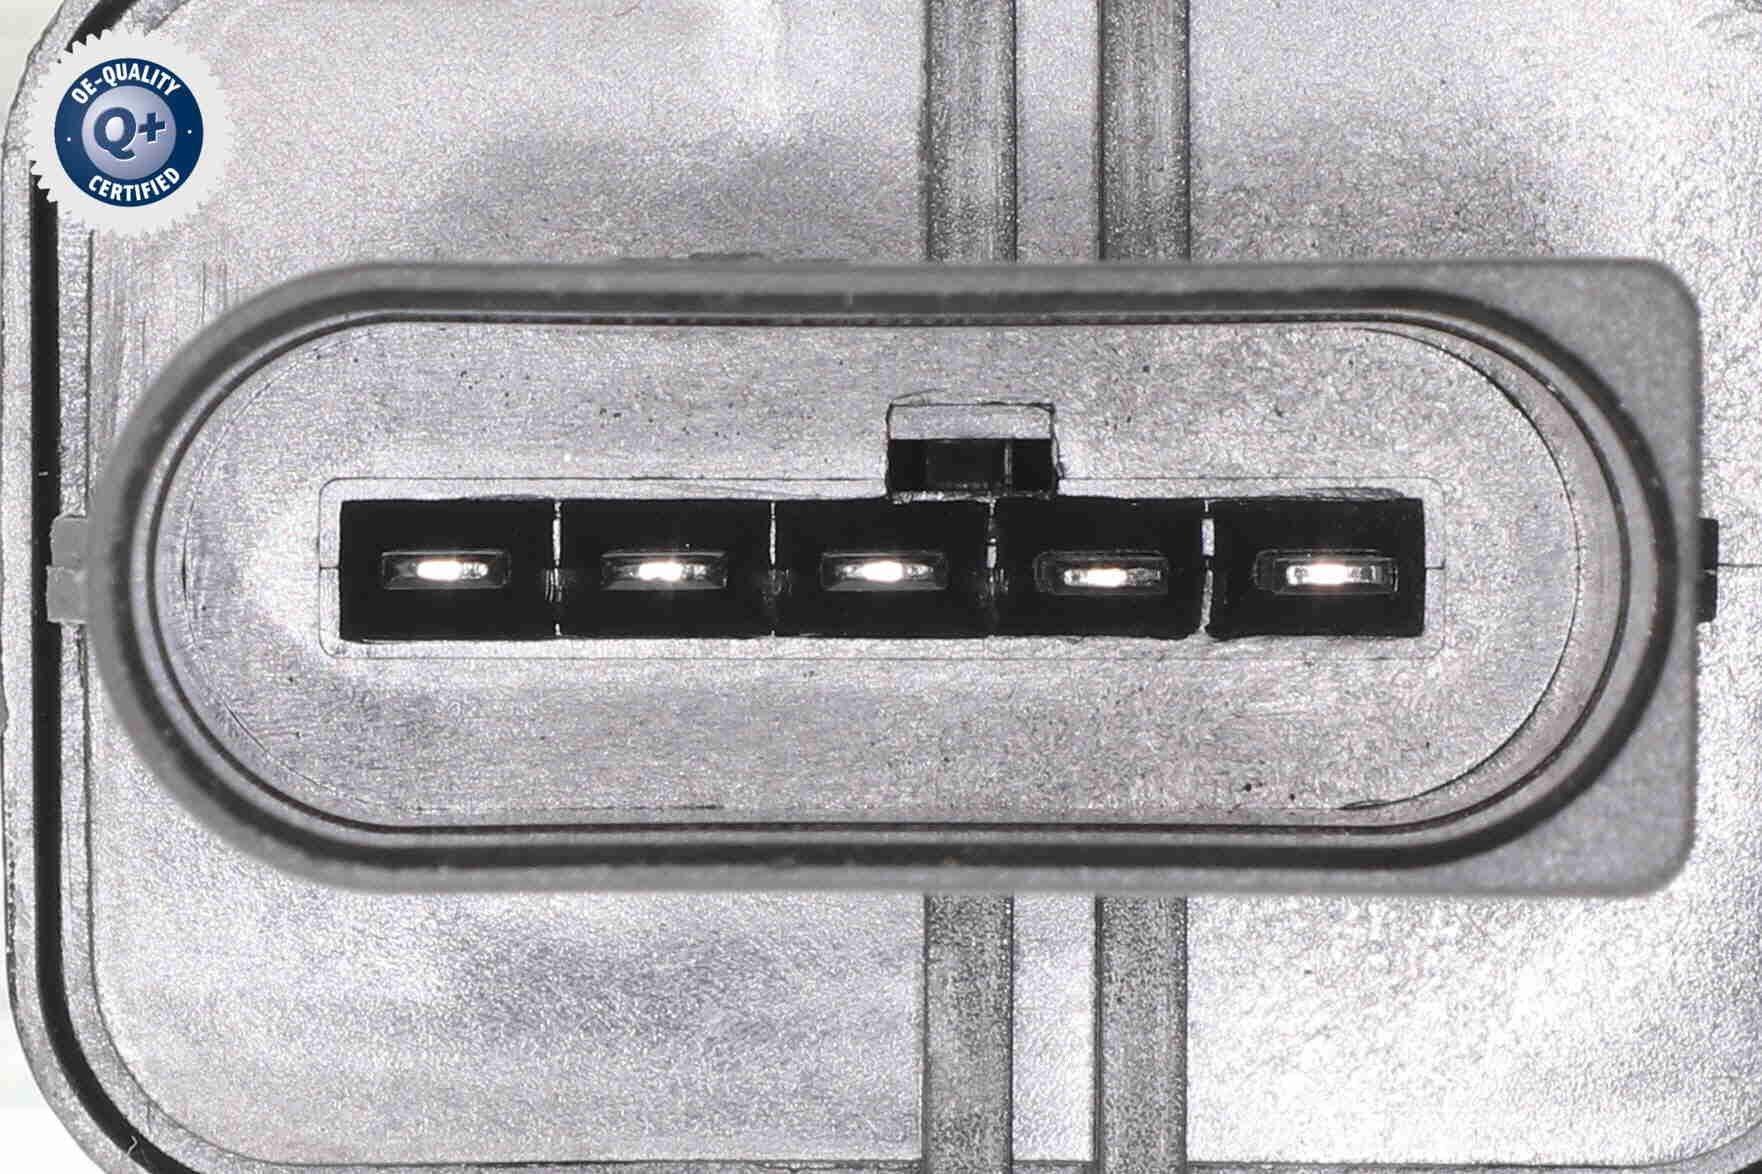 Elektromotor, Fensterheber 12 V hinten links VEMO V20-05-3028 Bild 2